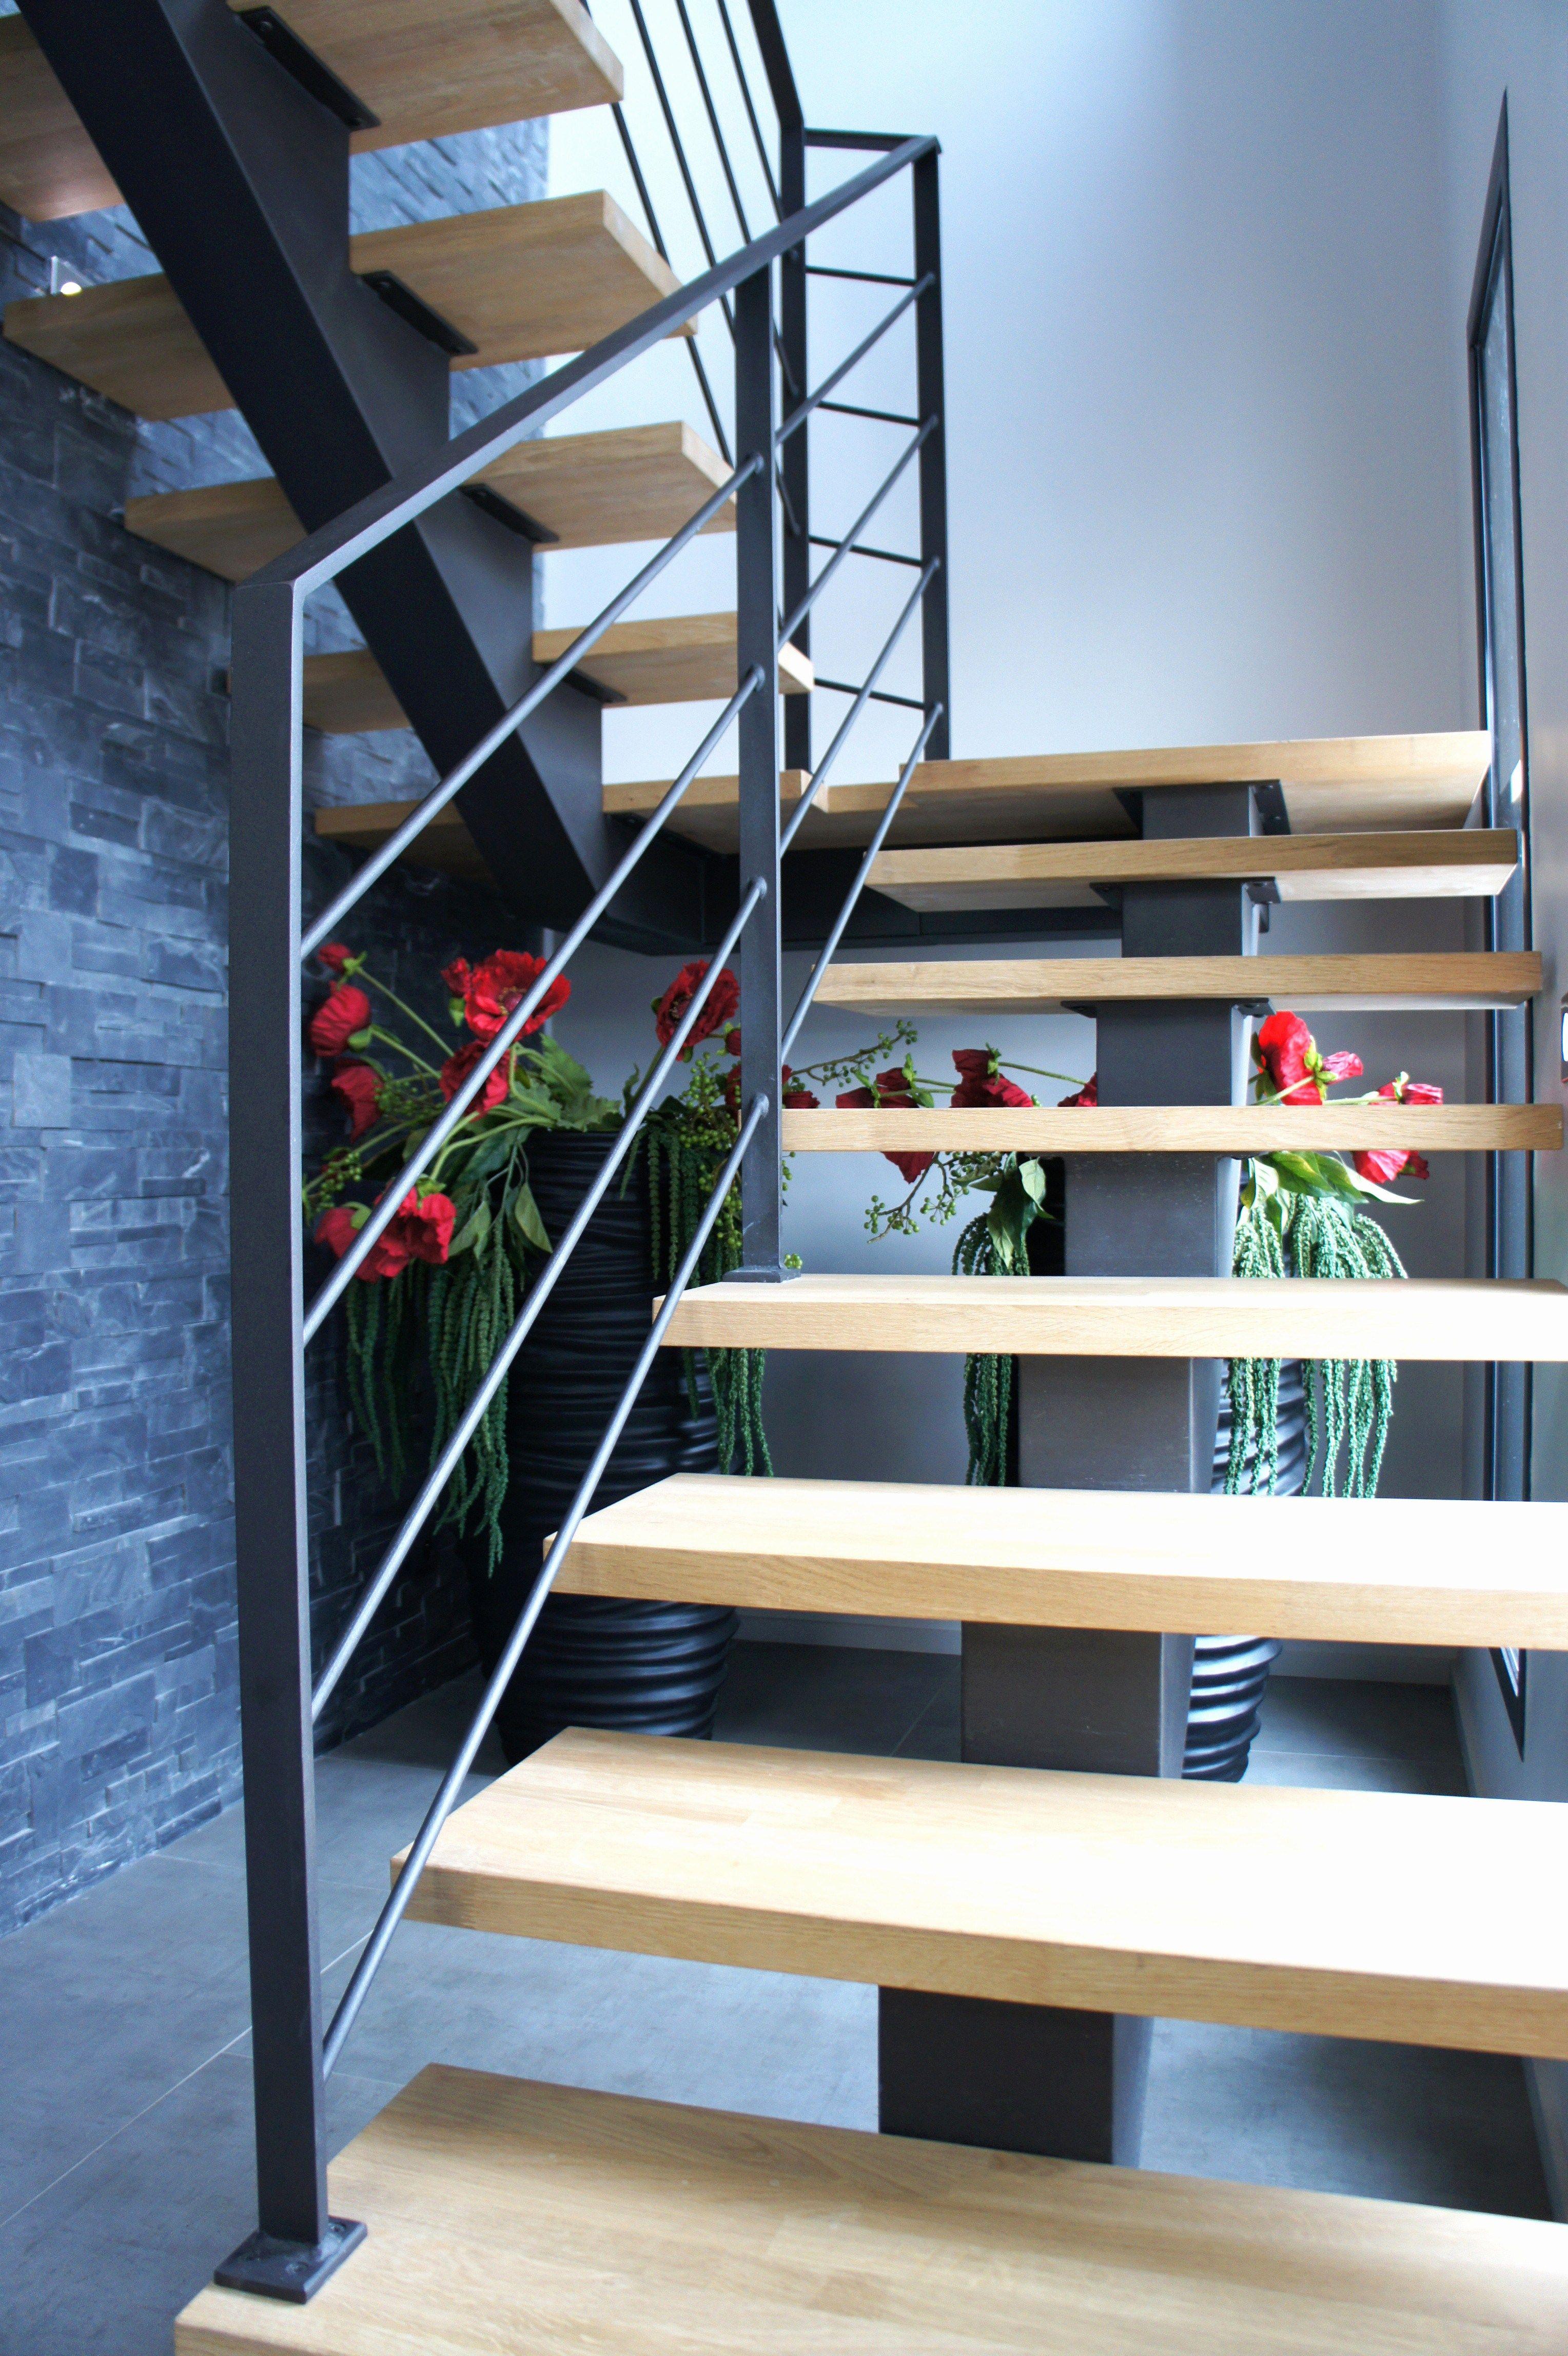 Beautiful Escalier Double Quart Tournant Leroy Merlin Glass Stairs Design Stairs Design Escalier Design